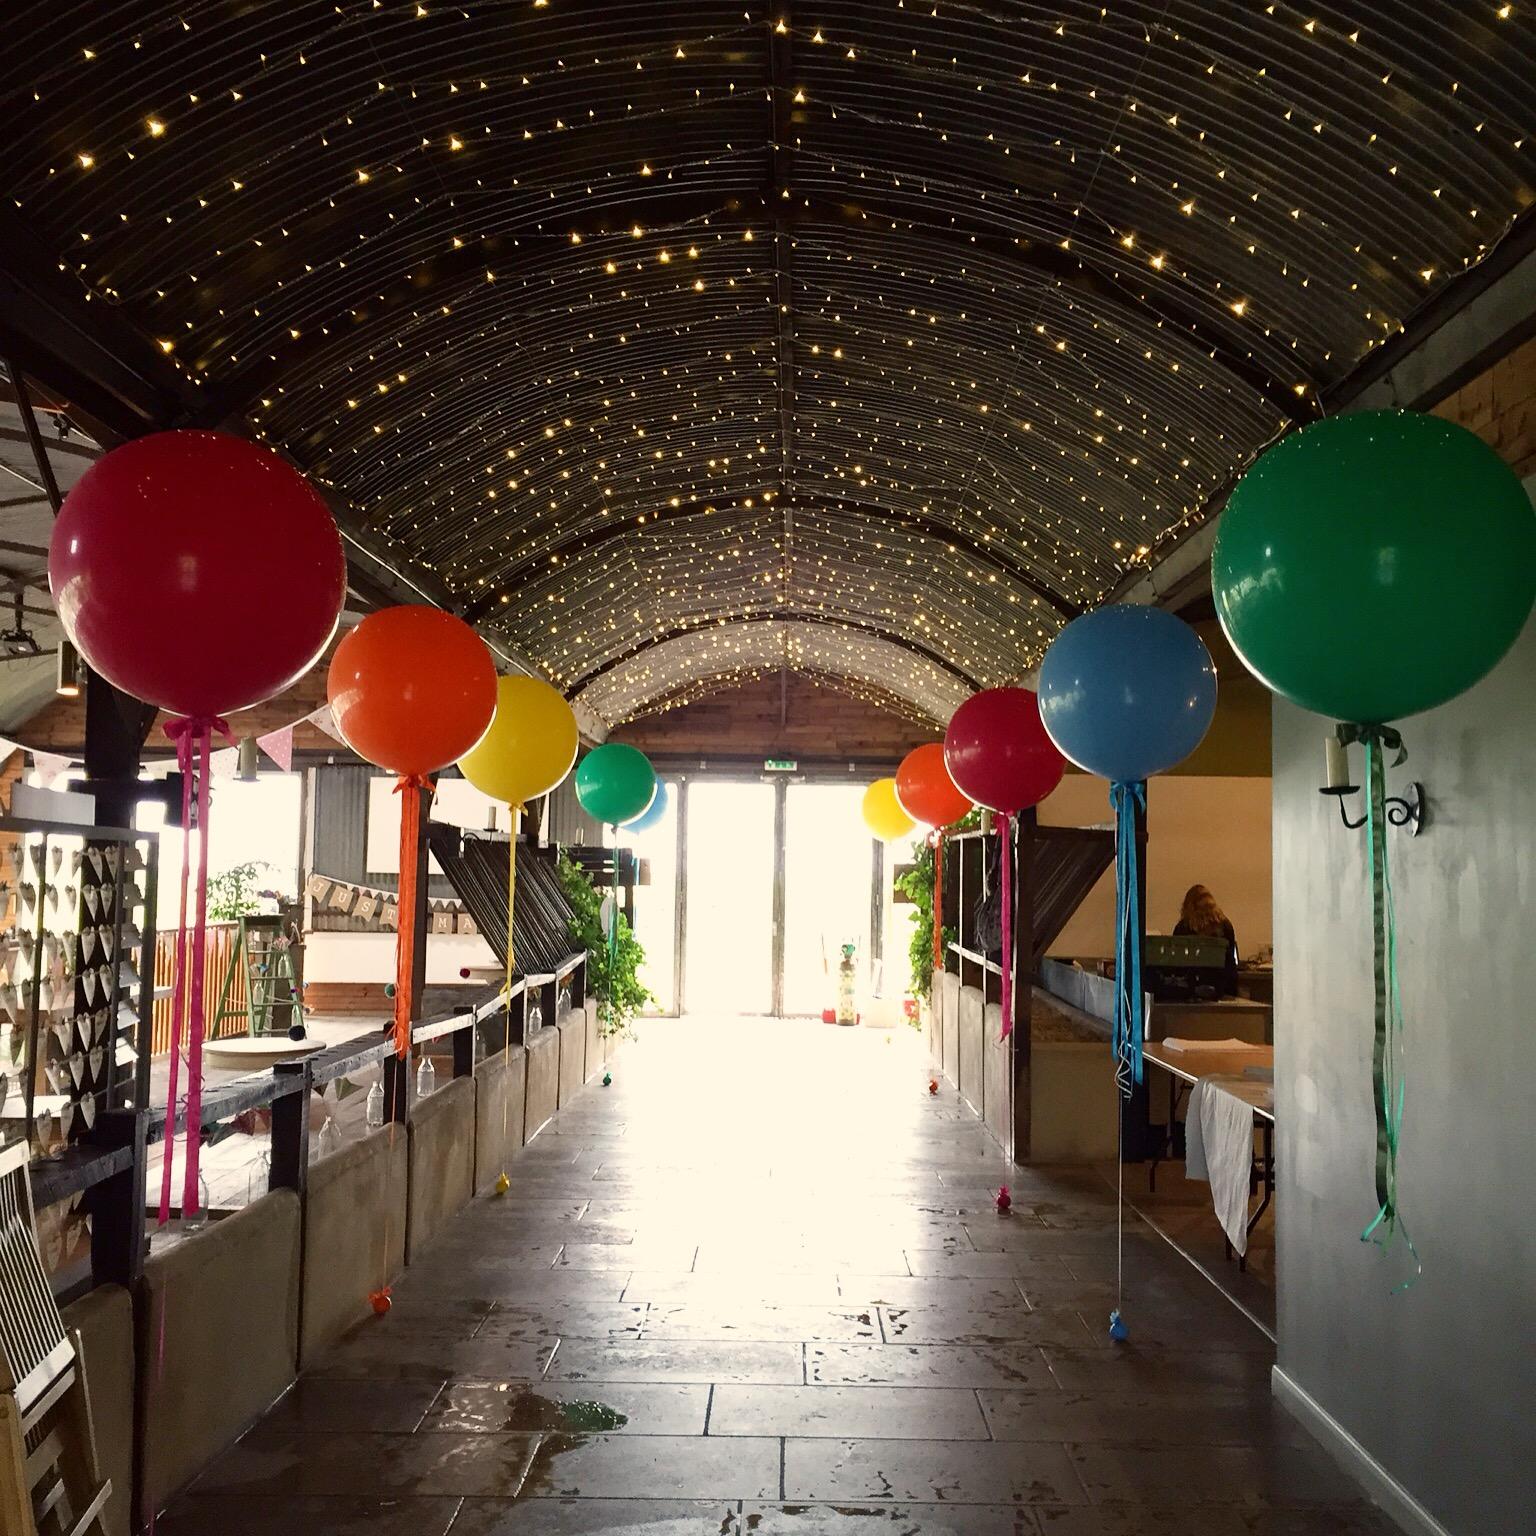 Stone Barn Giant Balloon Aisle